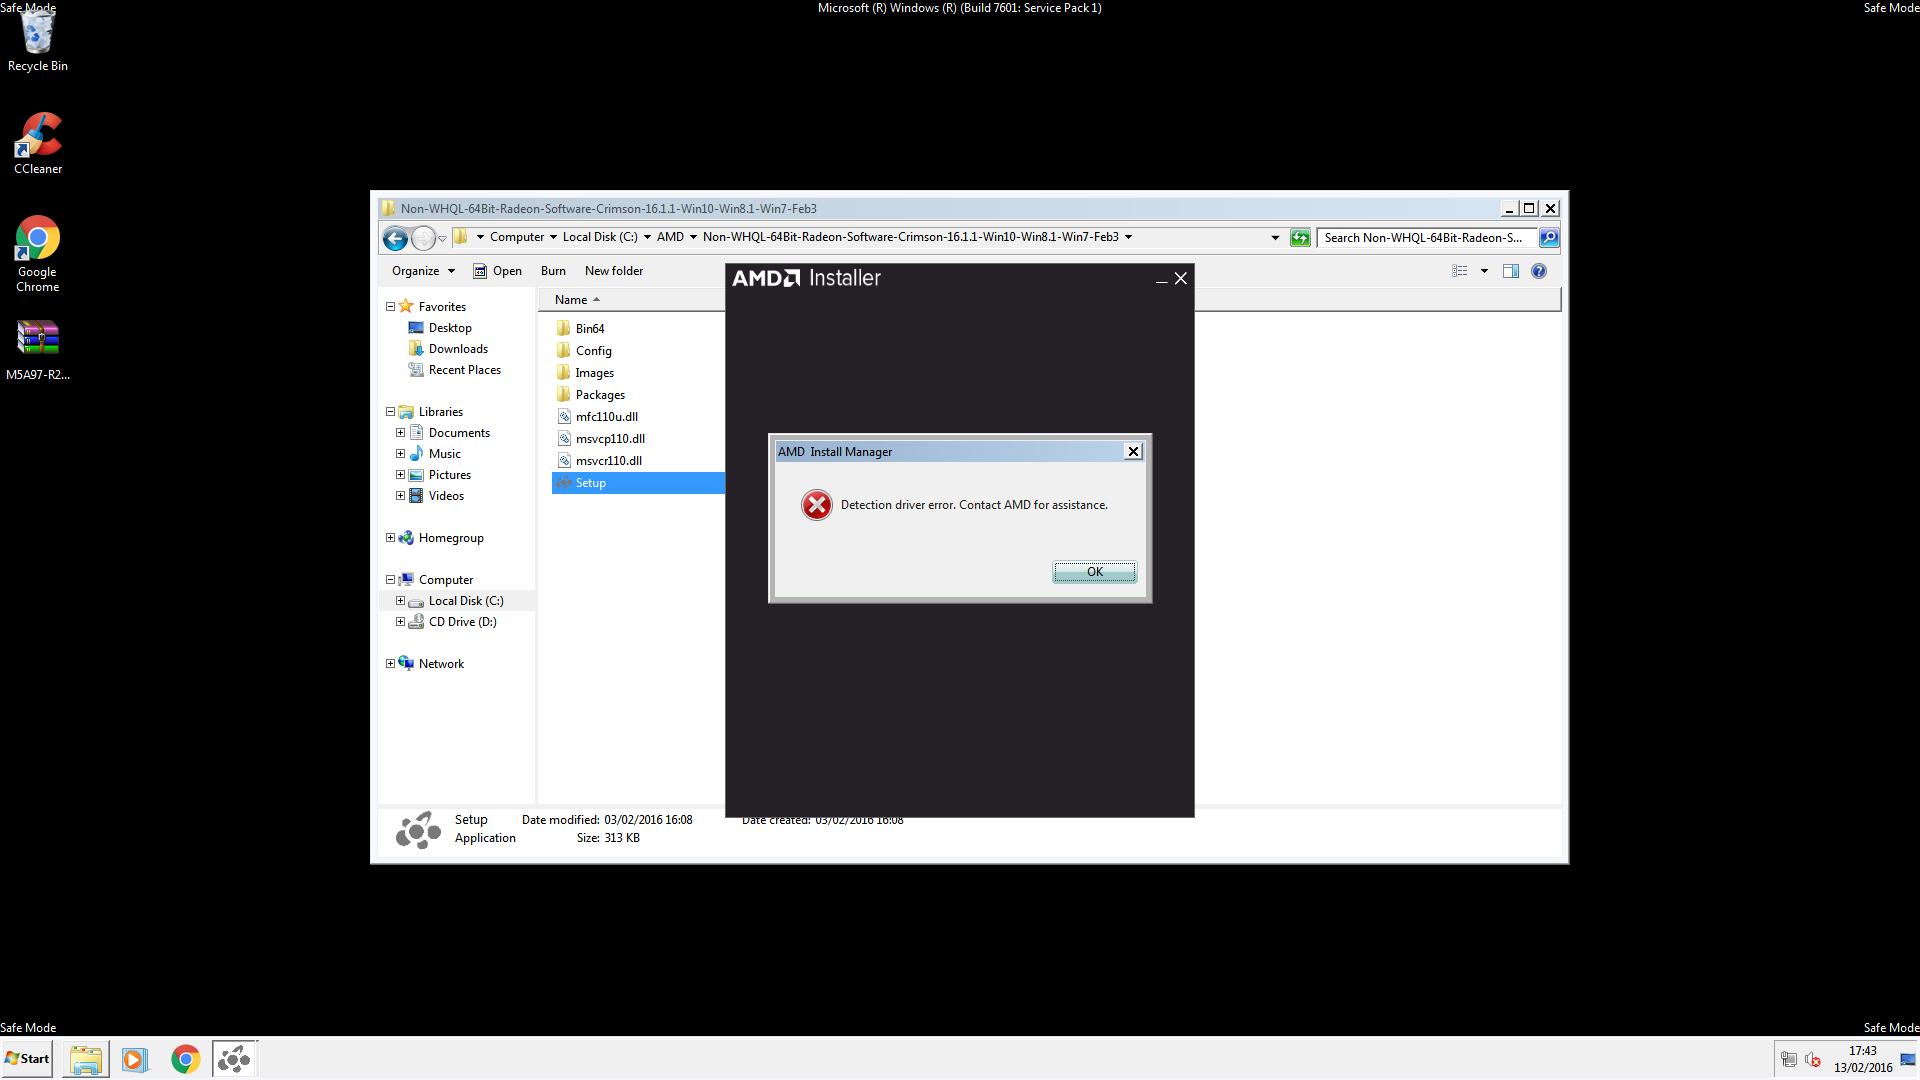 Windows Black Screen of Death - Please Help - Windows